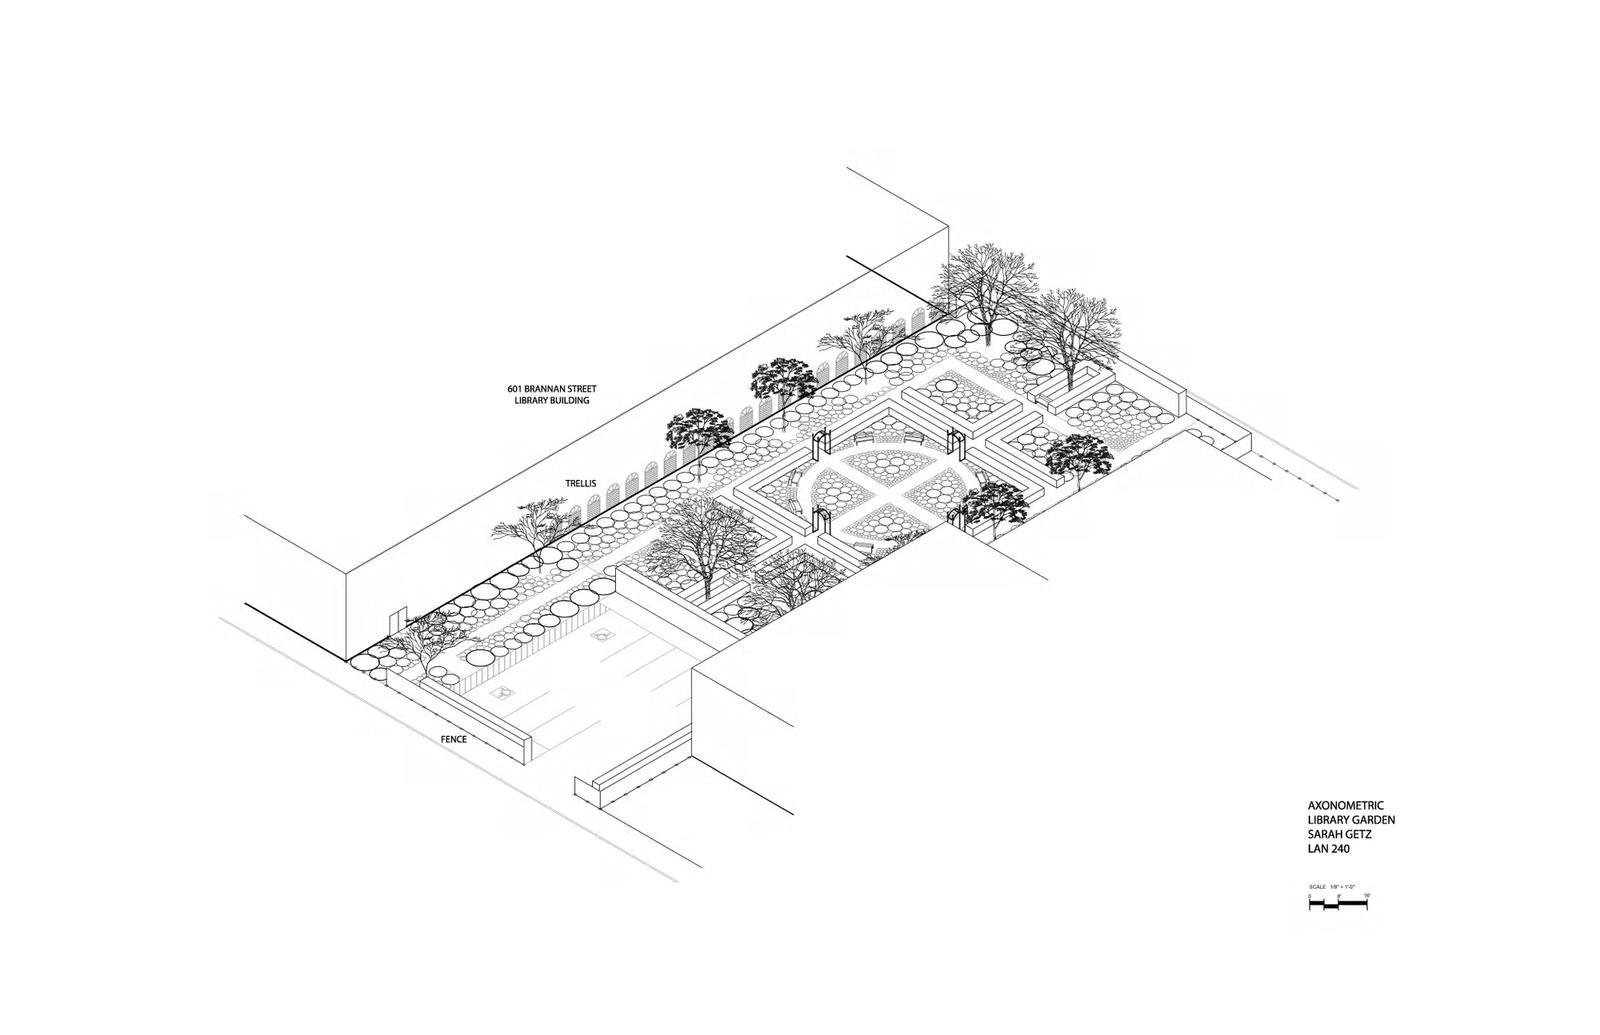 Library Garden for 601 Brannan Street Site 23